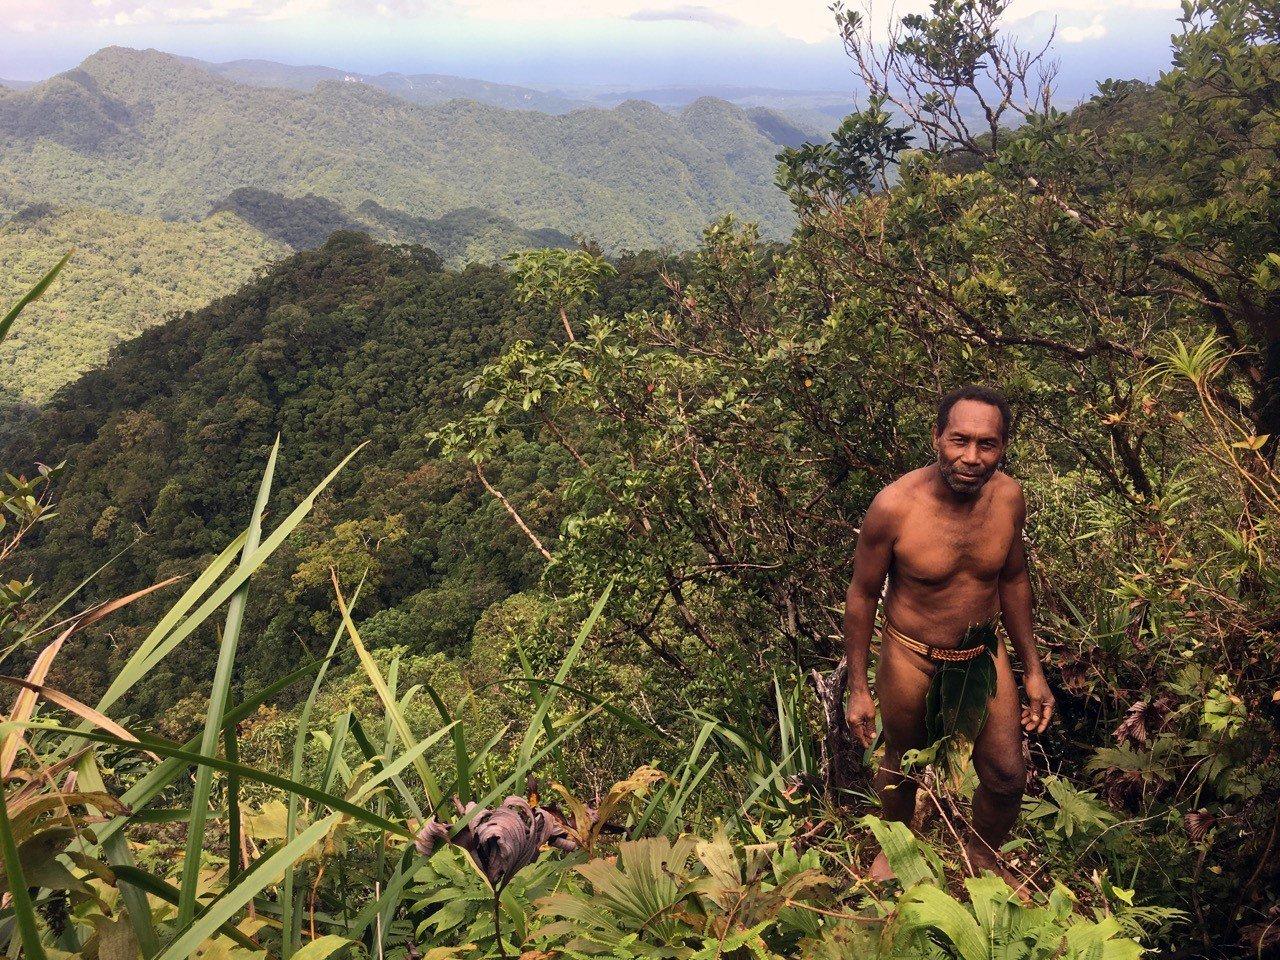 Chief Esau in the forests of Malaita, Solomon Islands